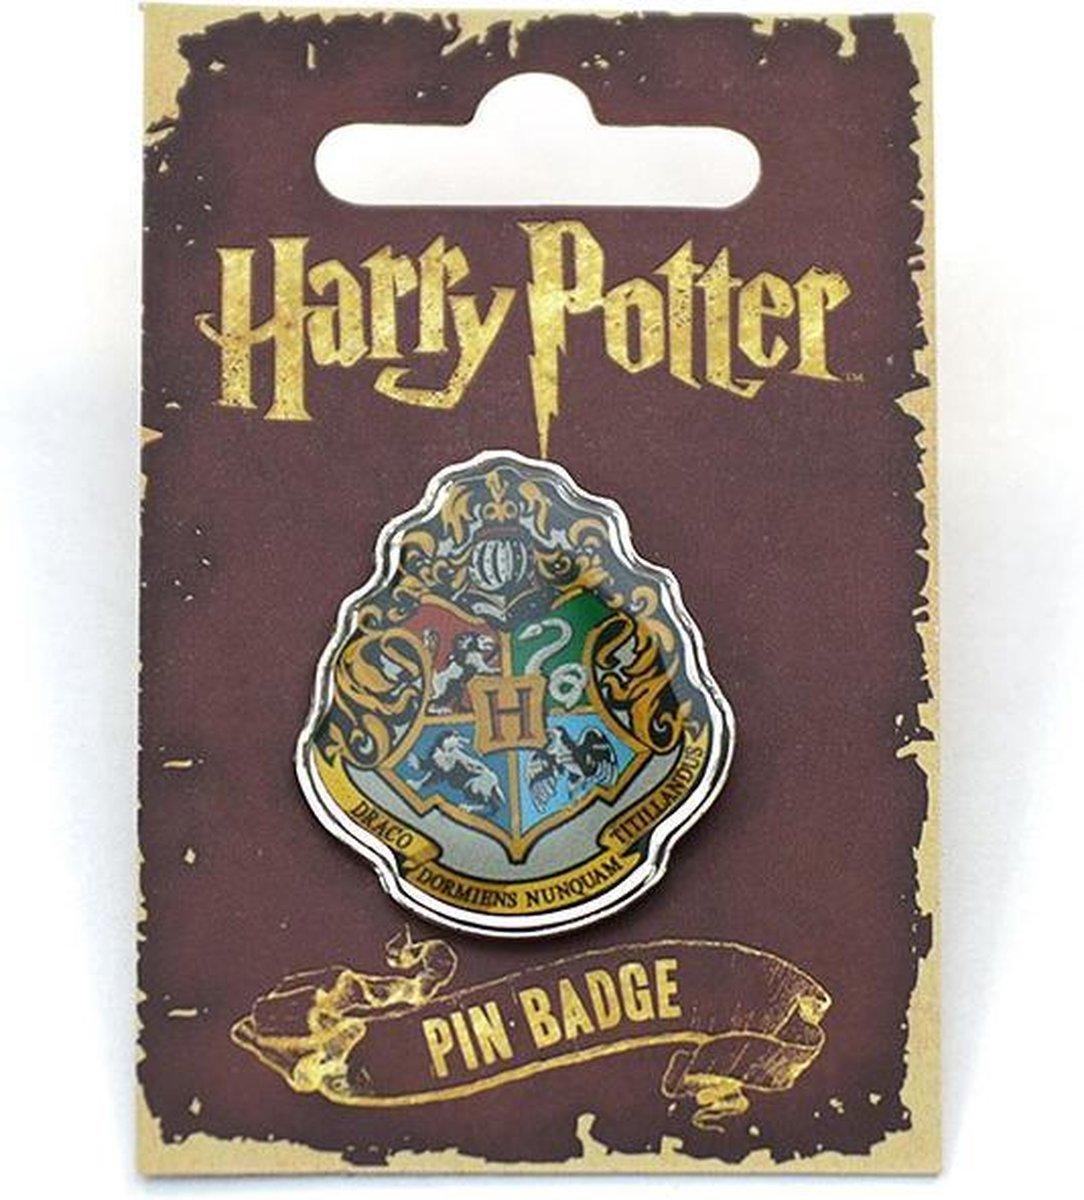 Harry Potter Quidditch Captain Badge Pin Speld